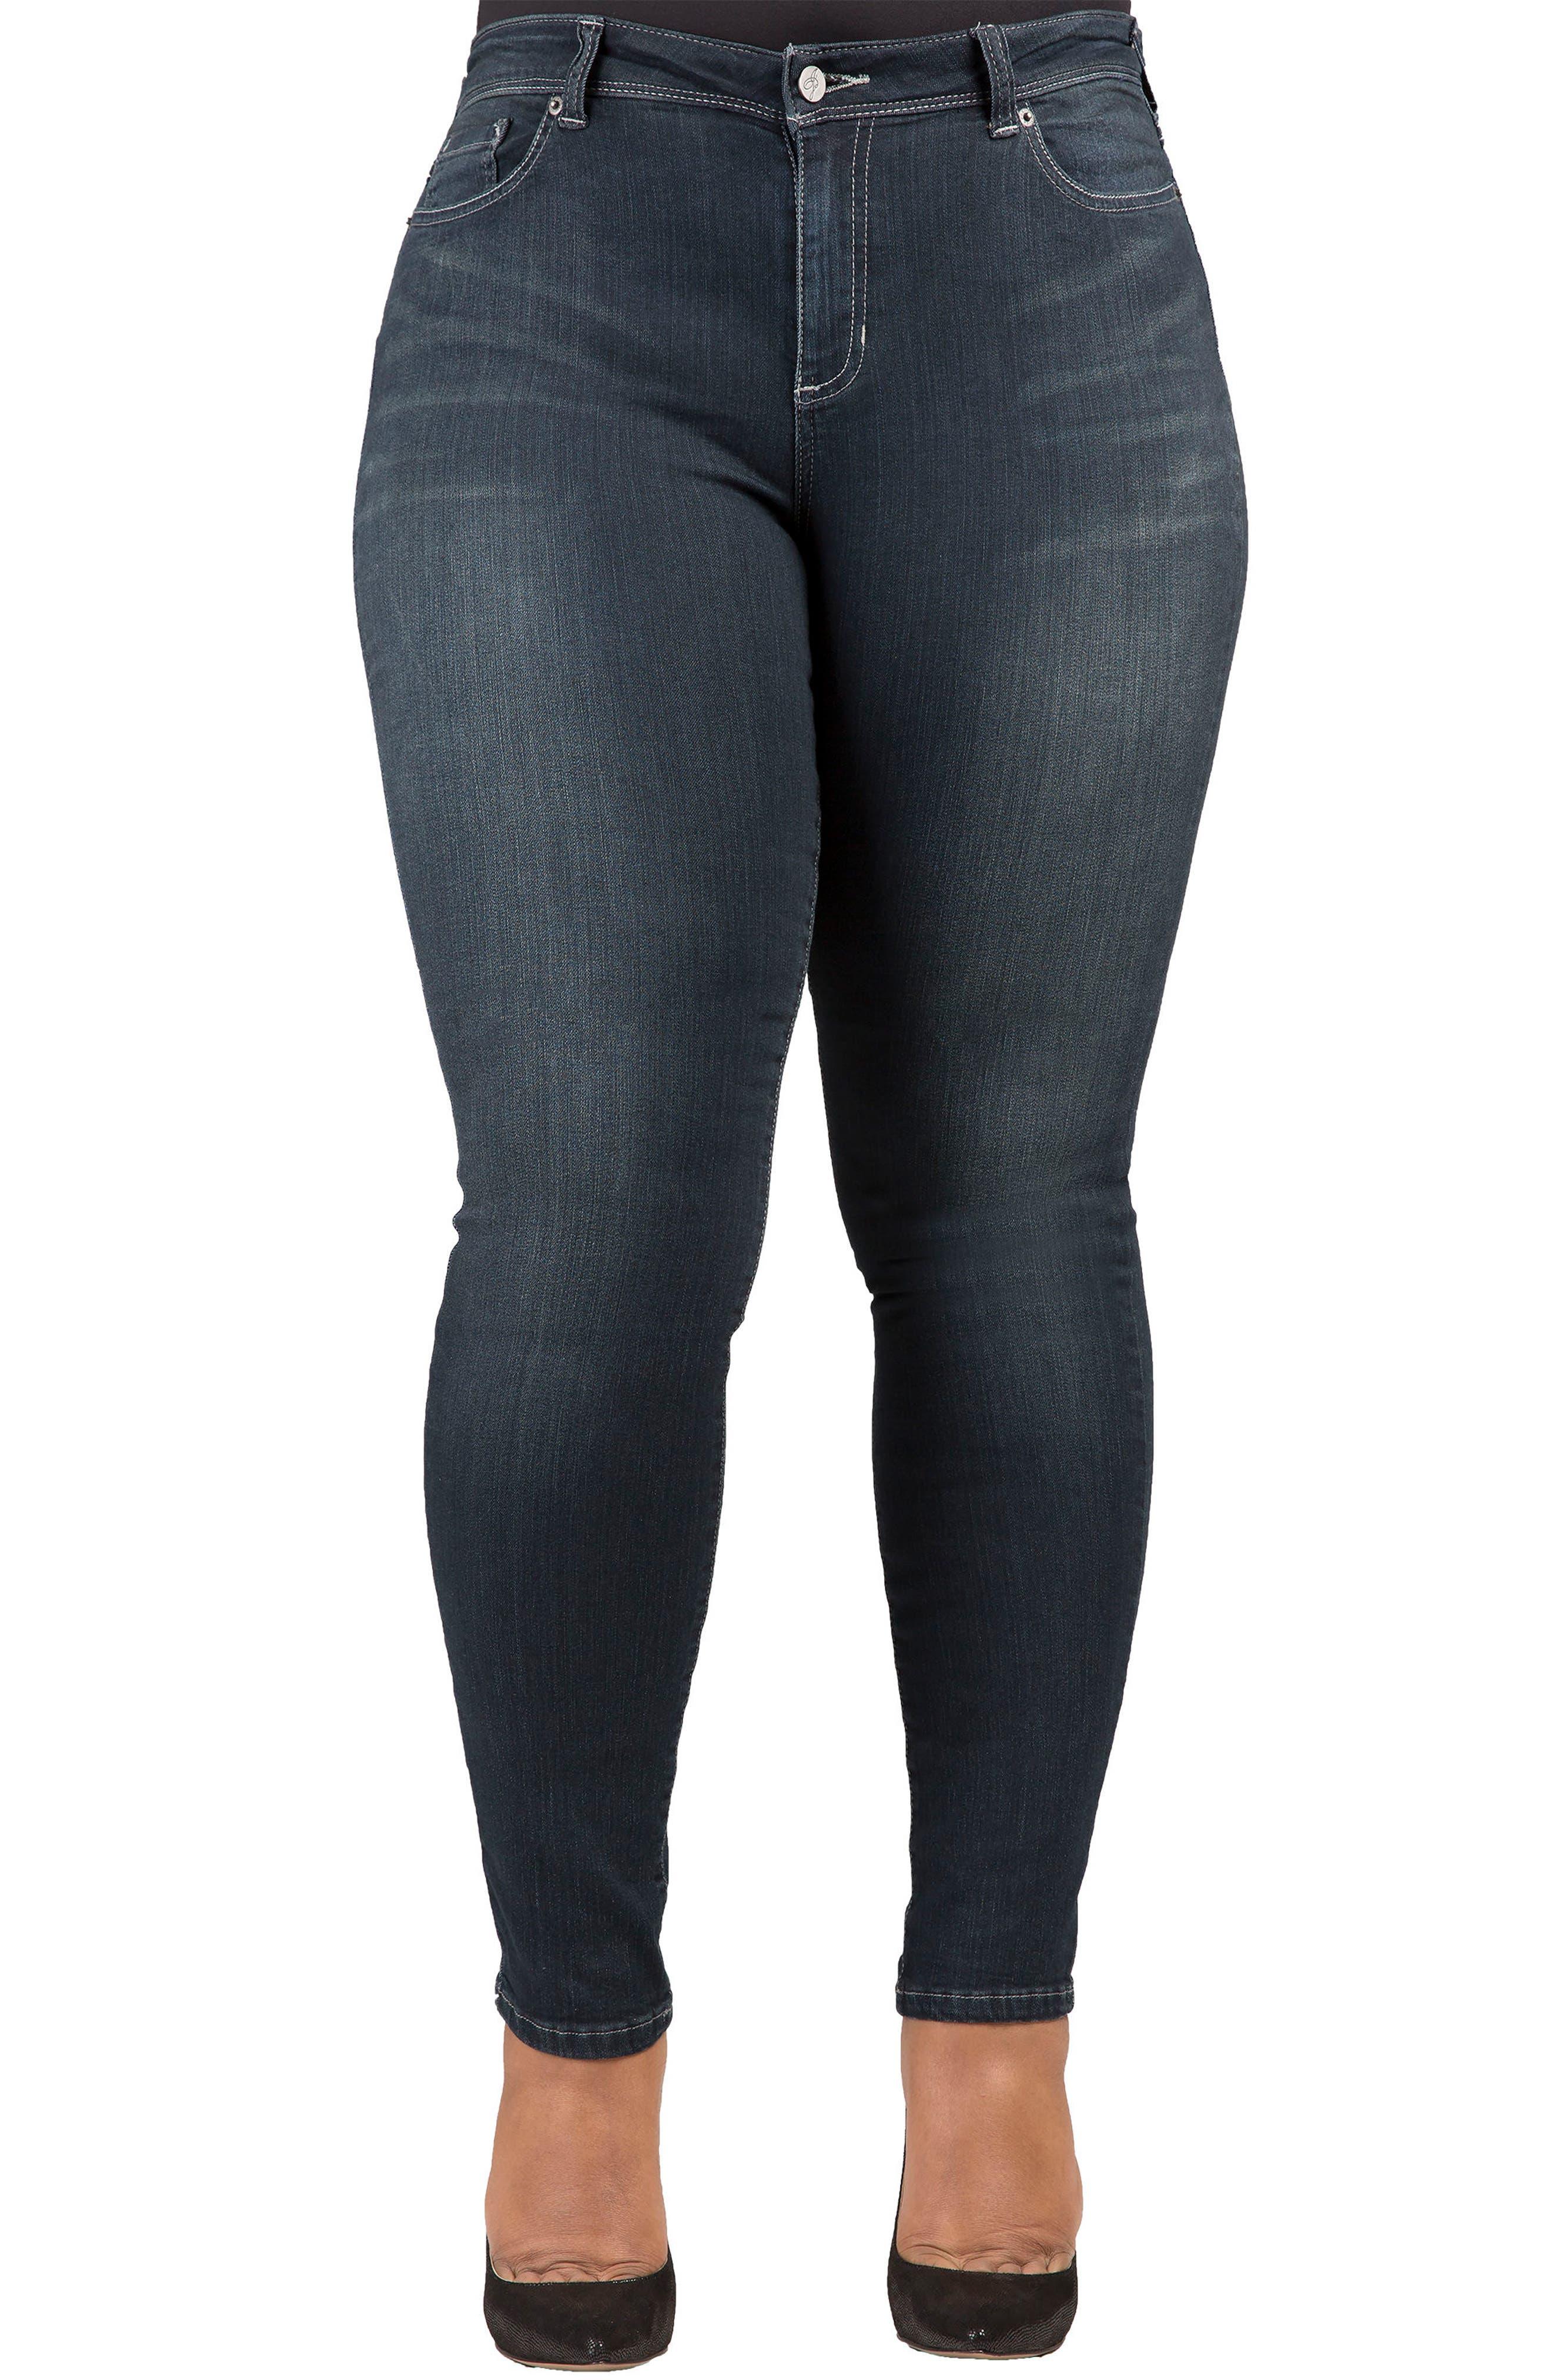 'Maya' Stretch Skinny Jeans,                         Main,                         color, 1464Kingsc